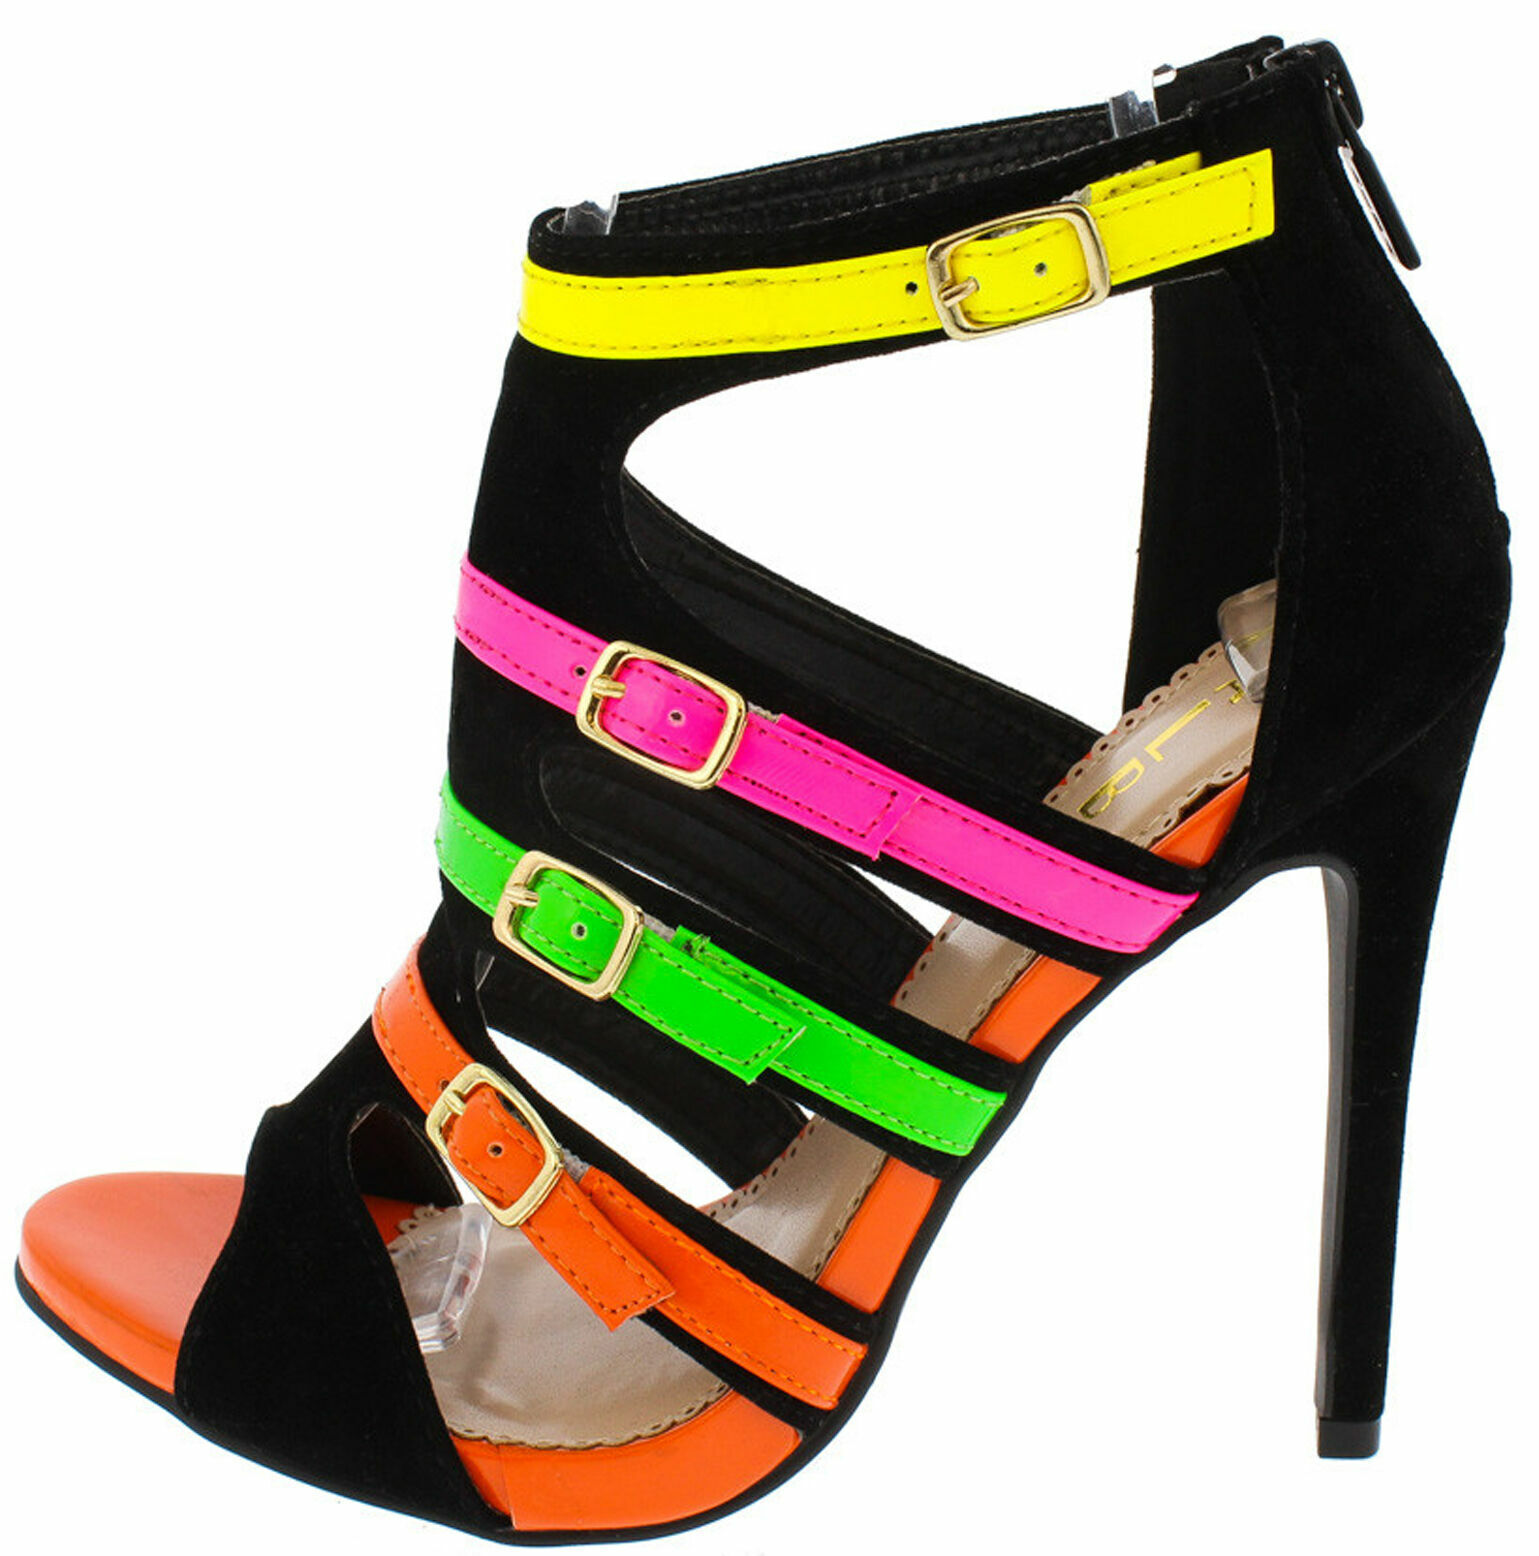 Multi-Colored Neon Strappy Buckled Peep Toe Stiletto Heel Sandals, US 6